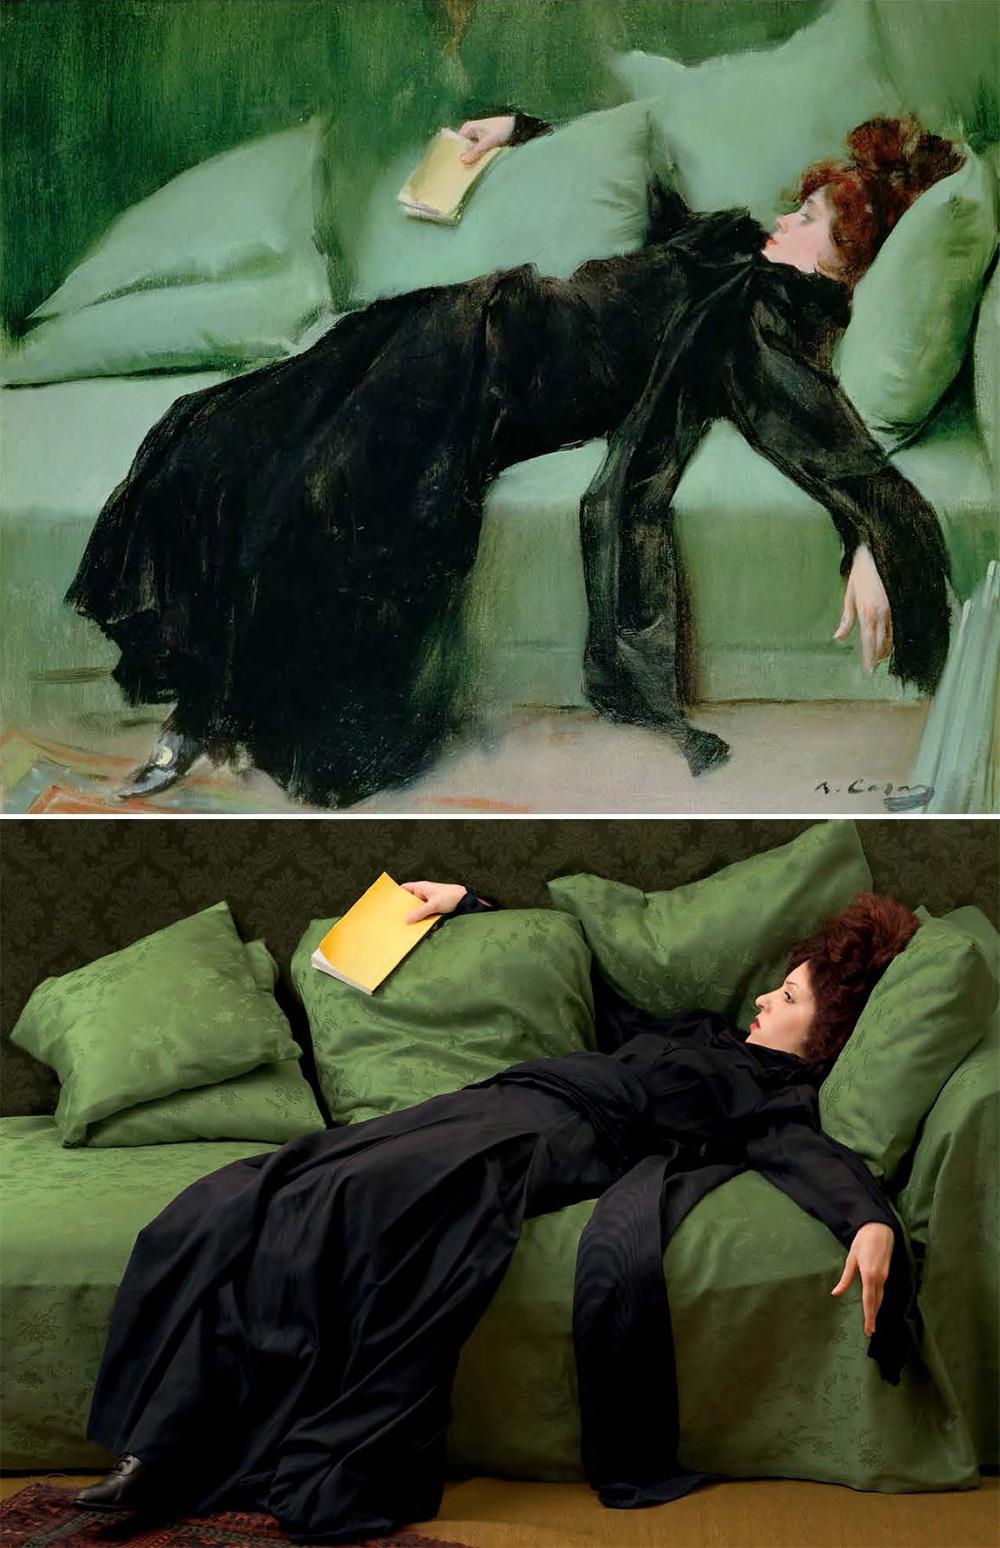 dipinti-famosi-interpretati-versione-fotografica-remake-5